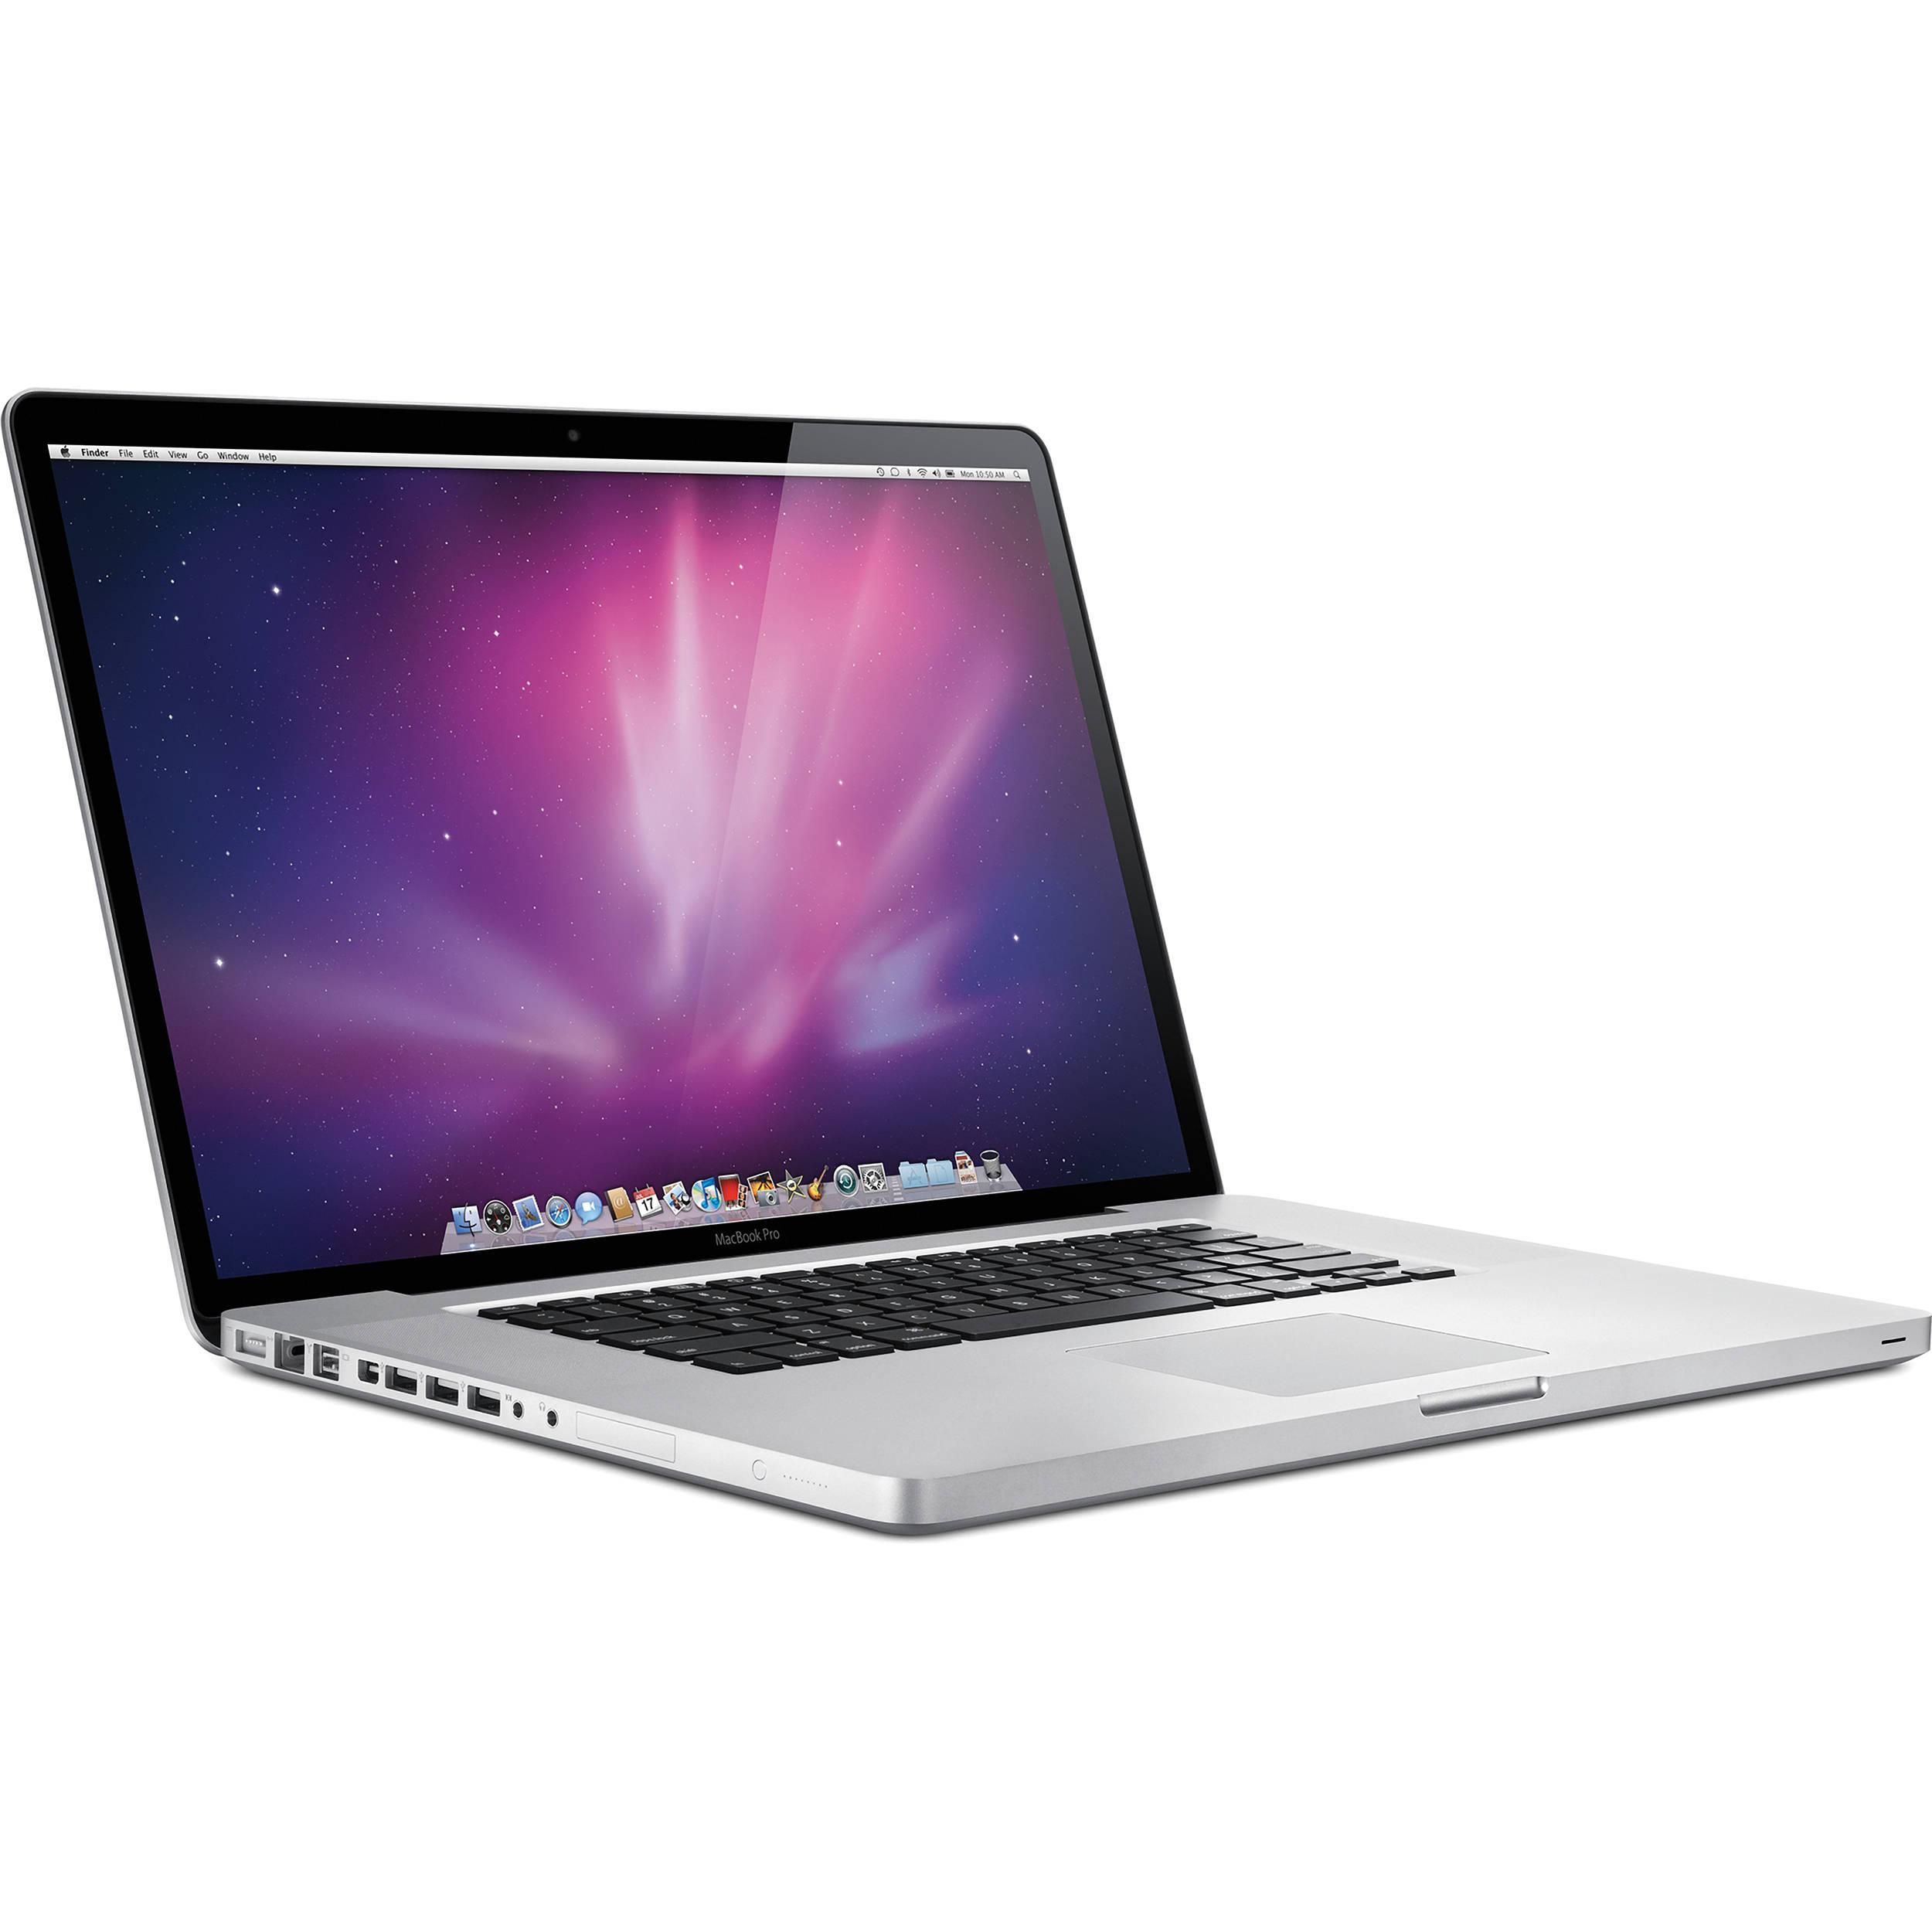 Apple 17 Quot Macbook Pro Notebook Computer Z0gp 0002 B Amp H Photo